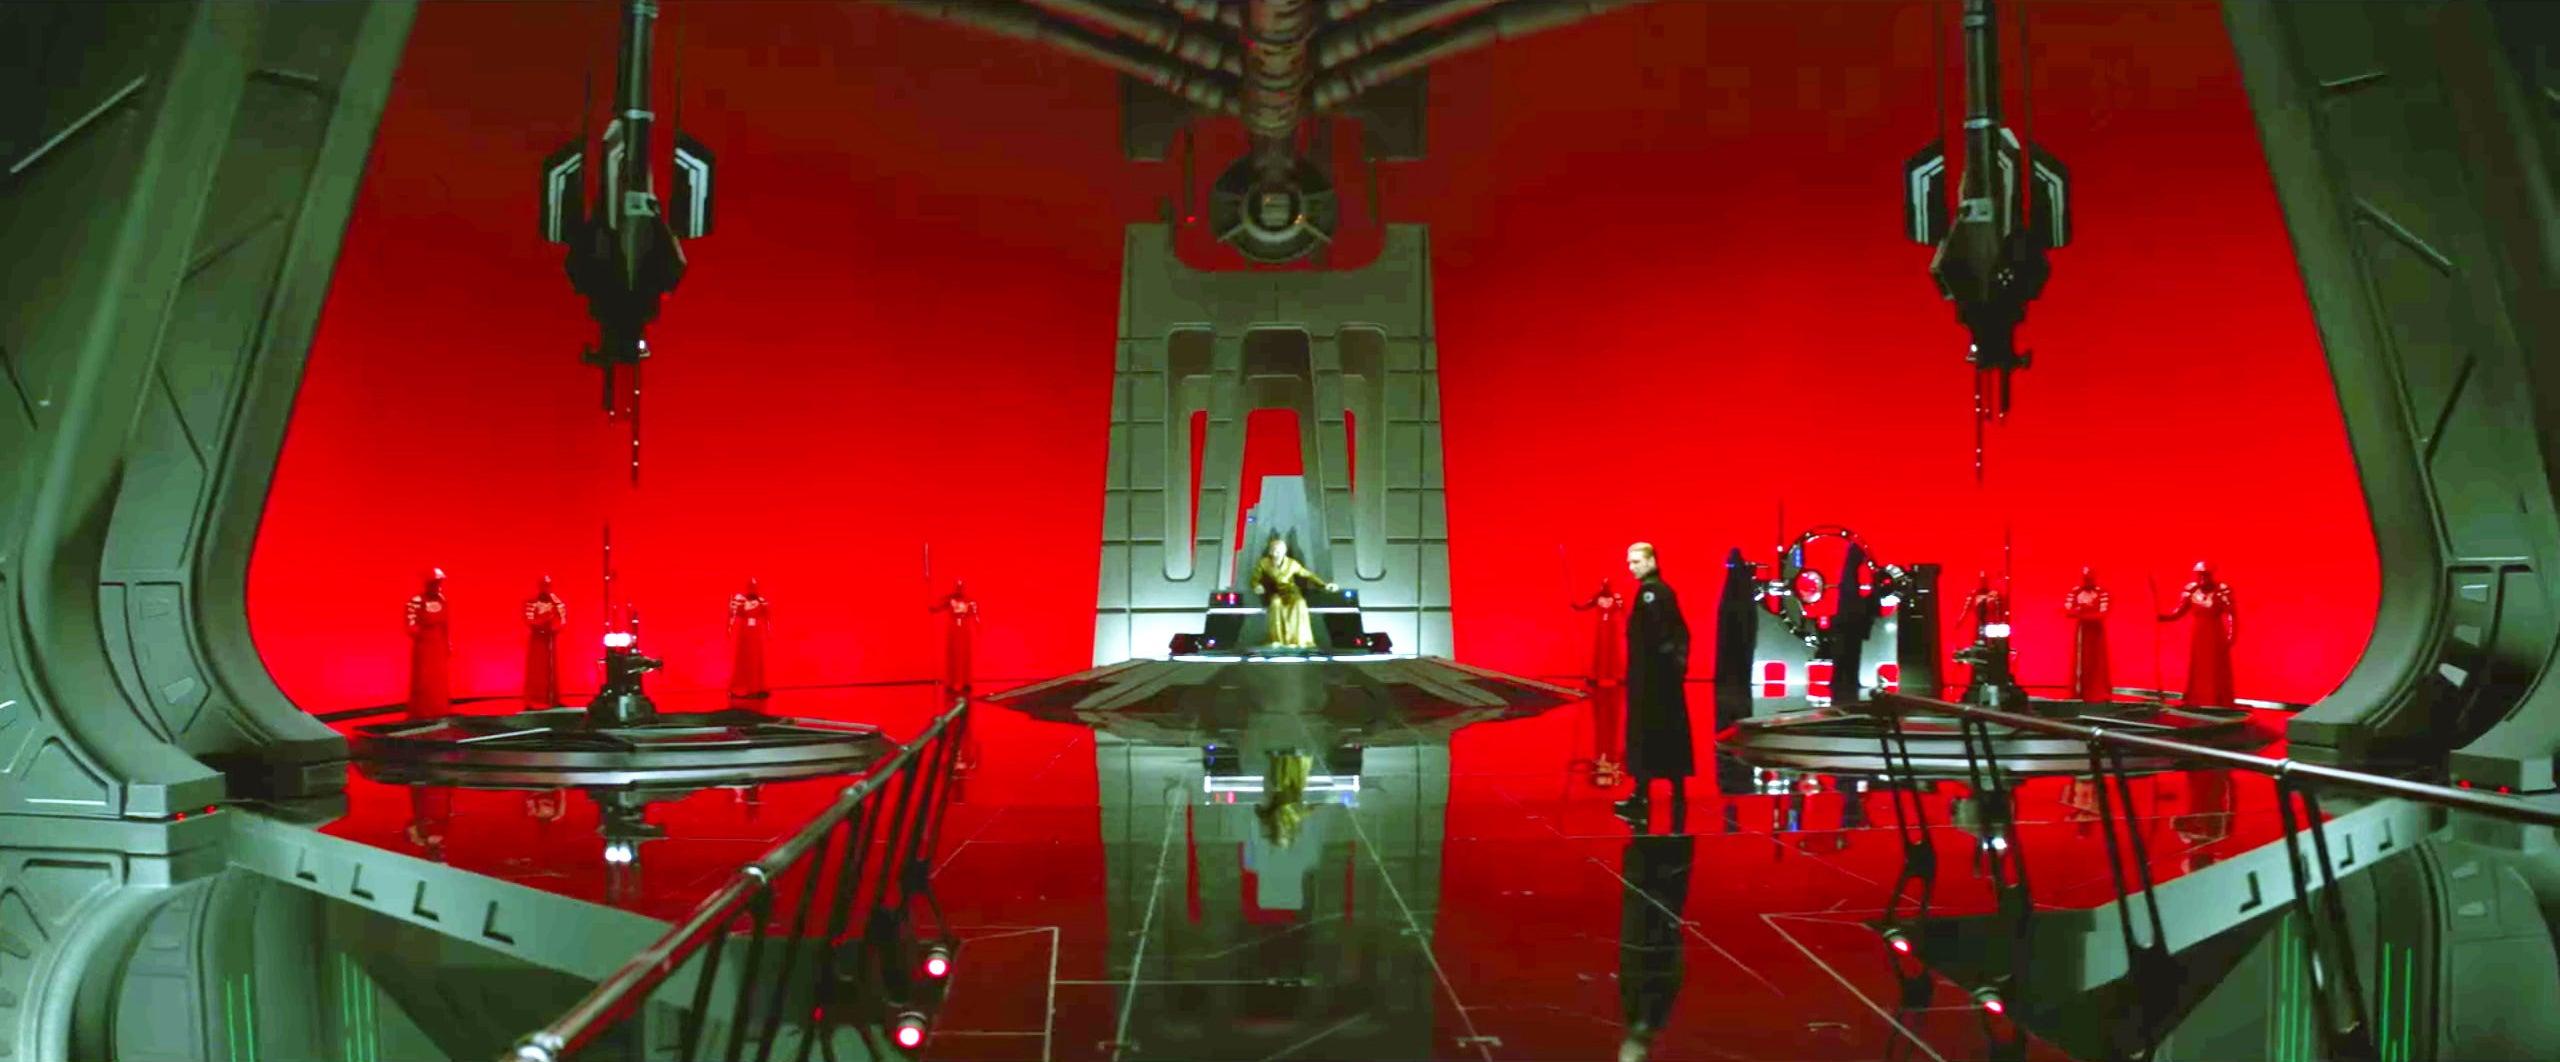 star wars the last jedi snoke throne room